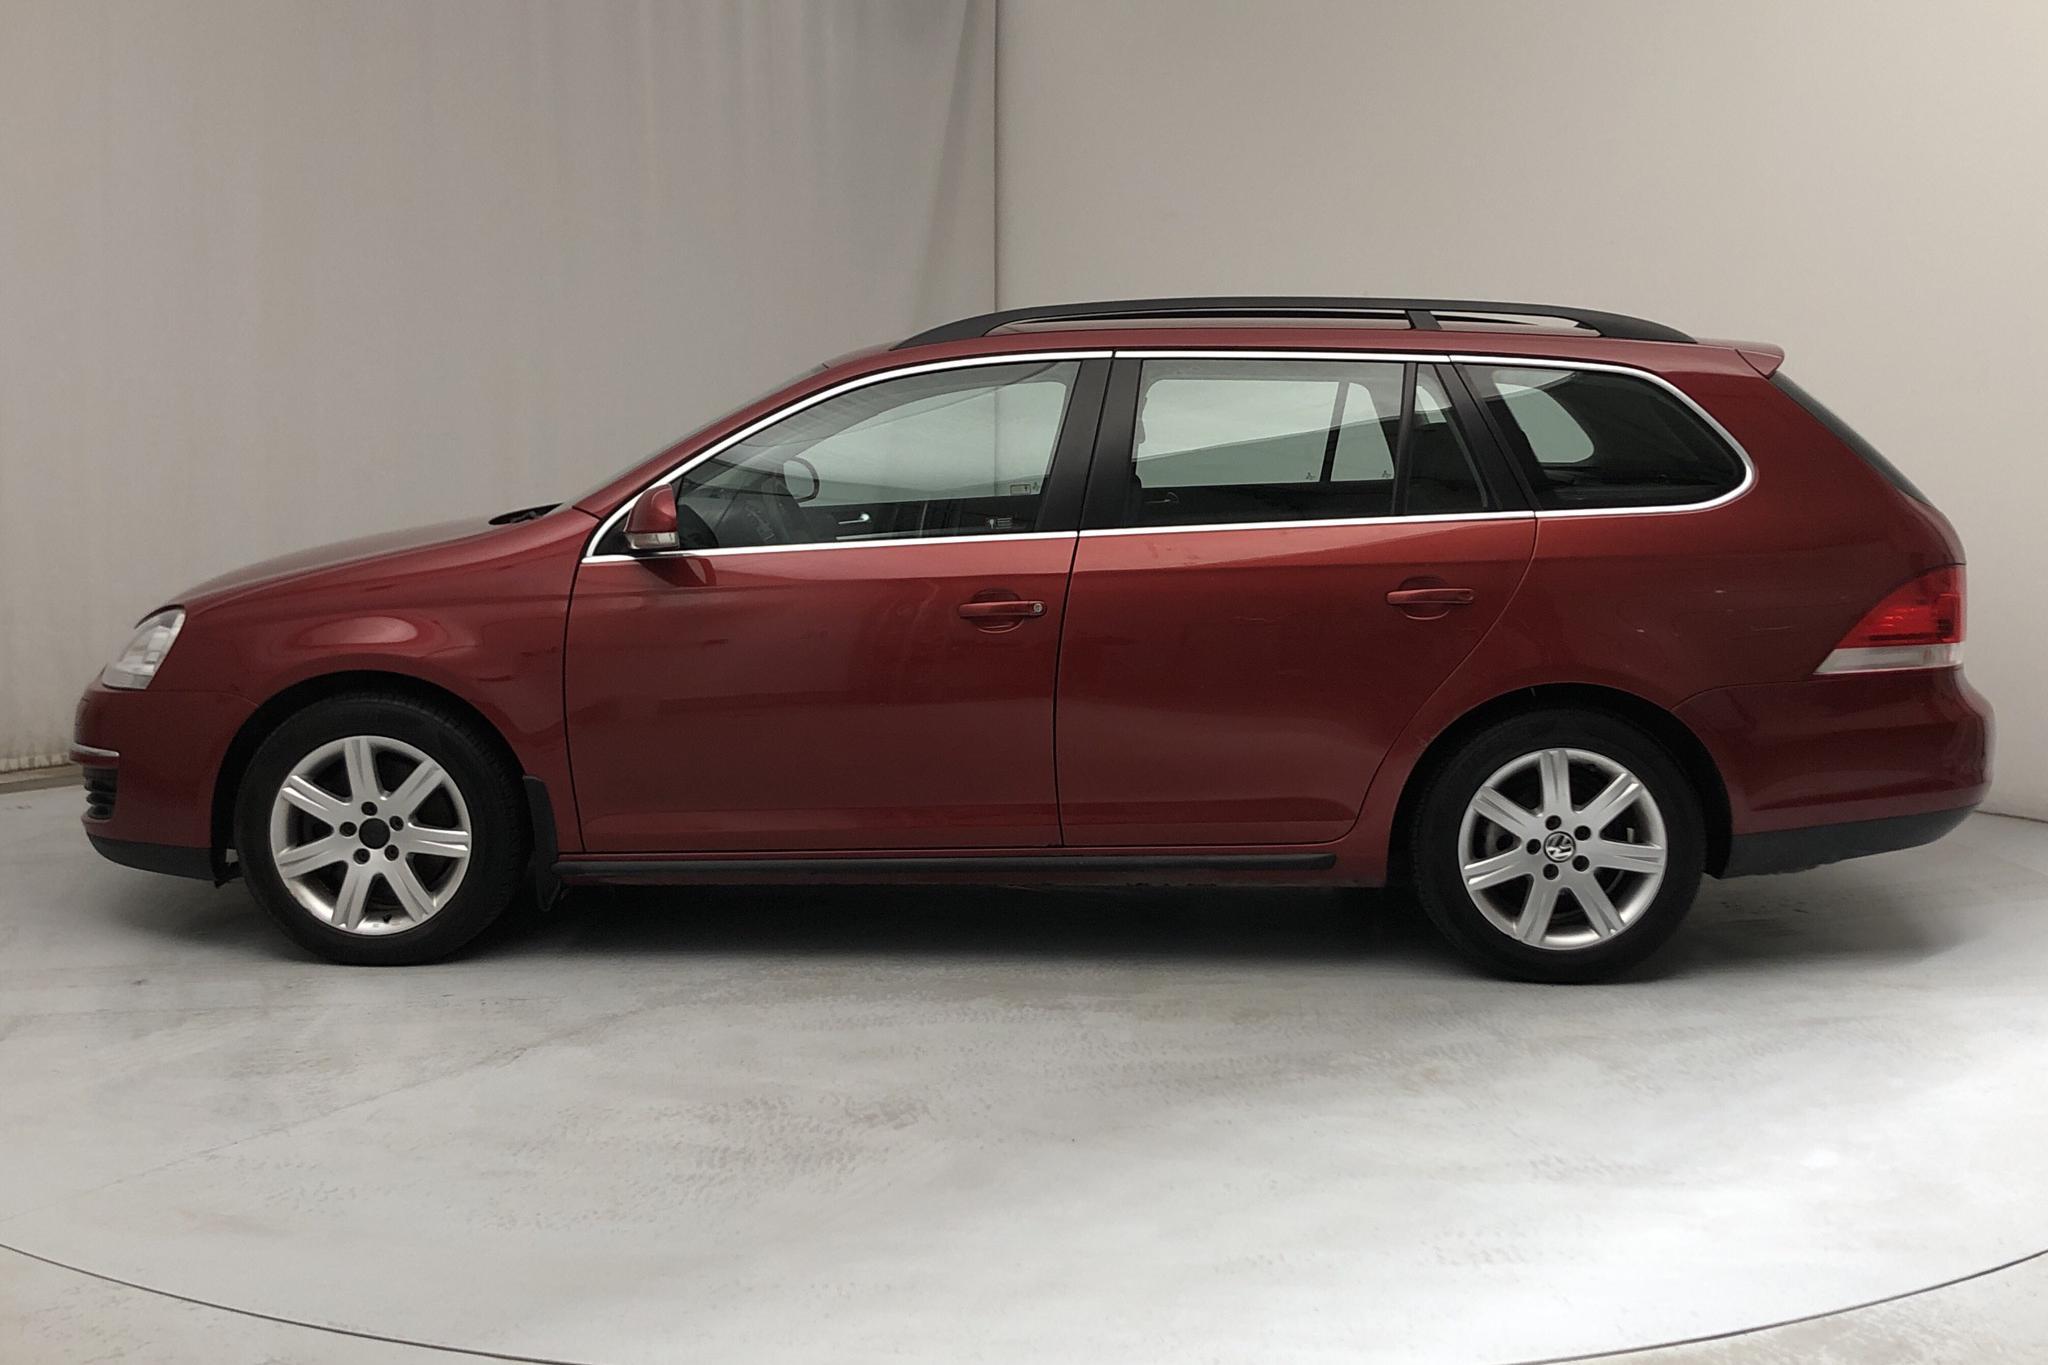 VW Golf A5 Variant 1.4 TSI (160hk) - 14 192 mil - Manuell - röd - 2009